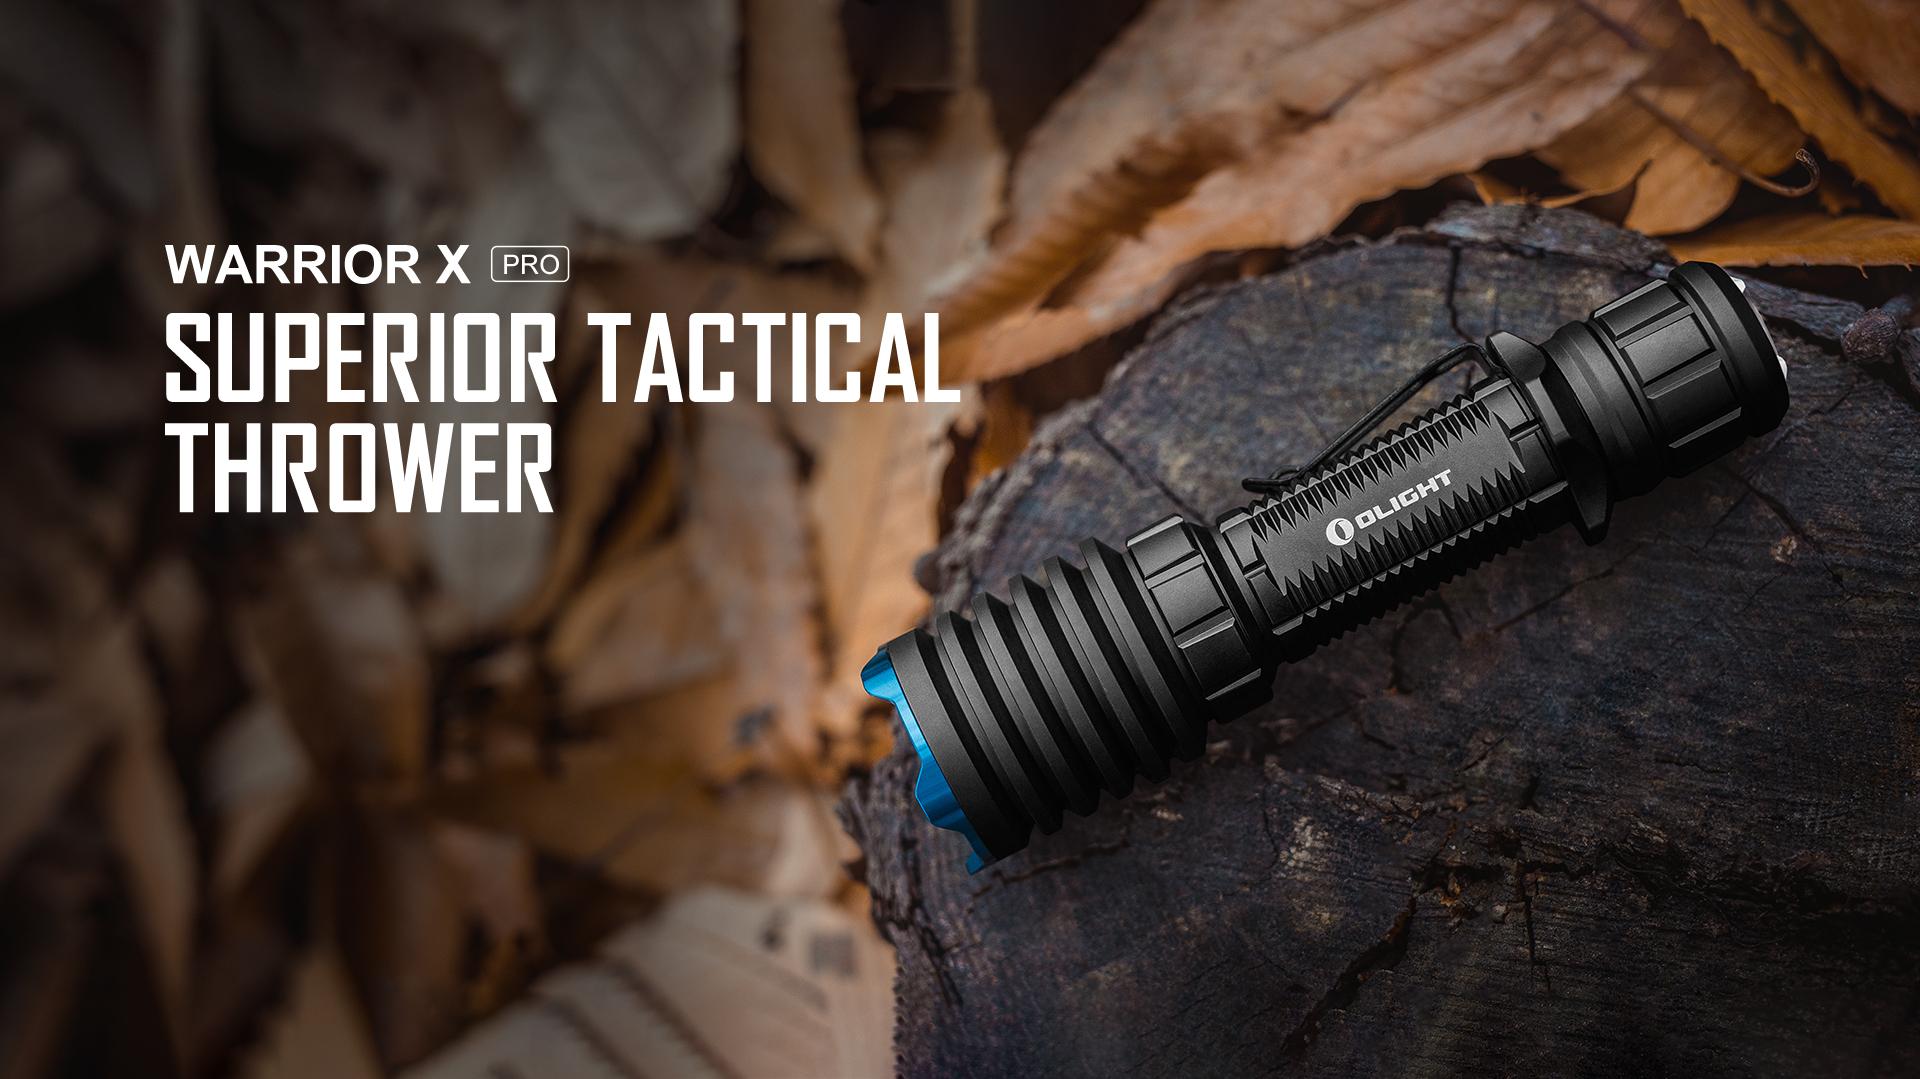 tactical torch,warrior x pro